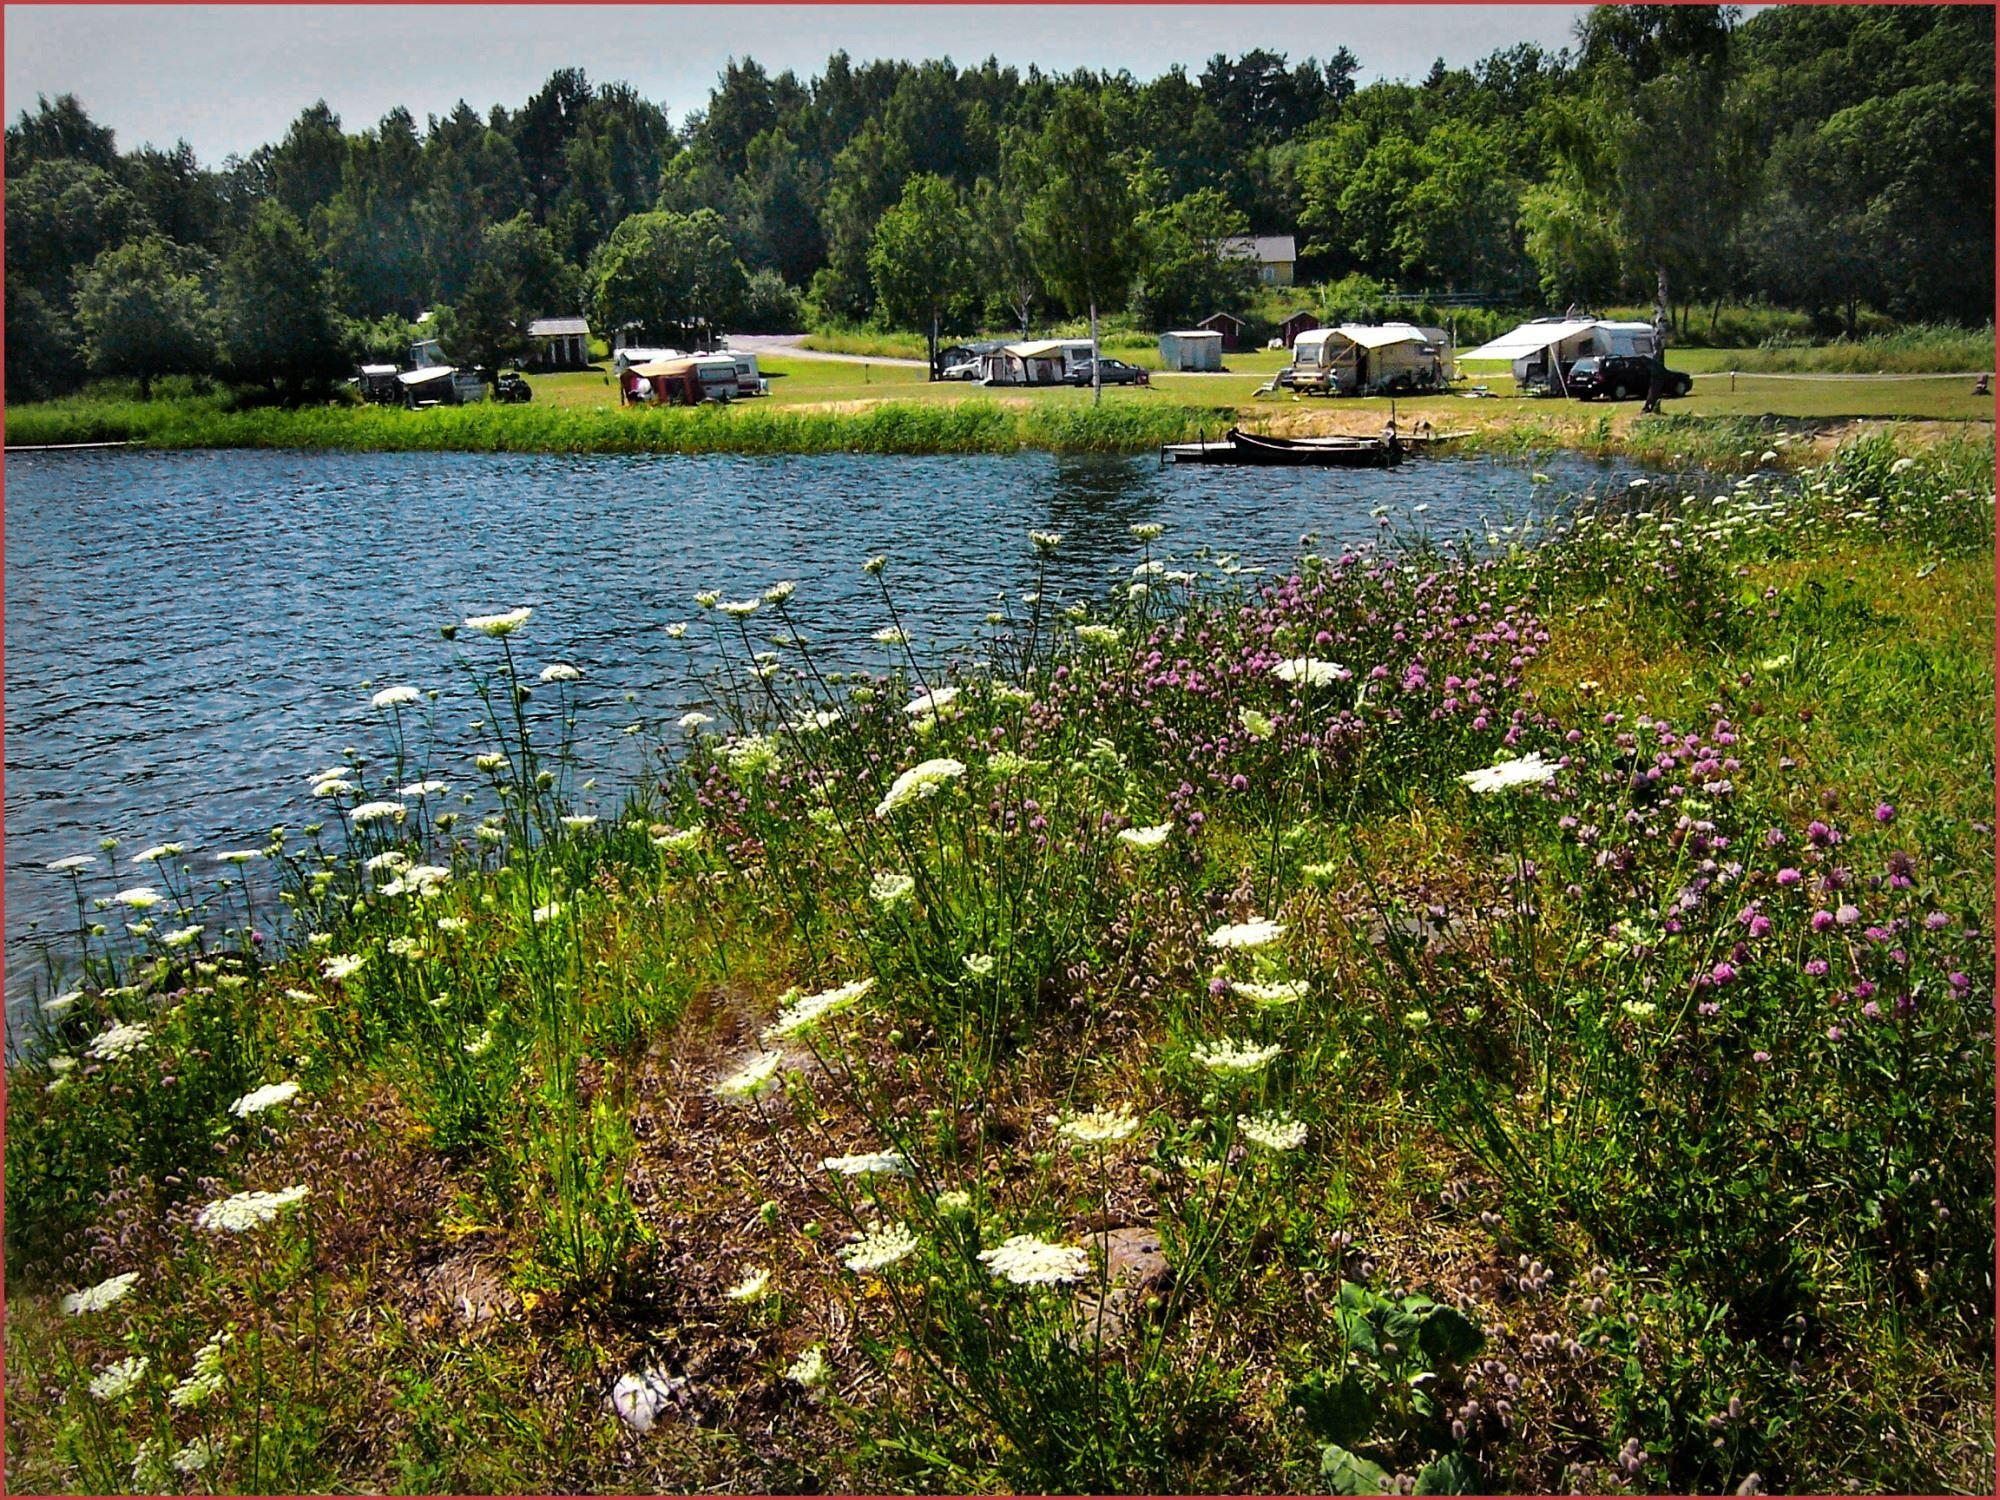 KustCamp Gamleby // Hammarsbadet / Campsite